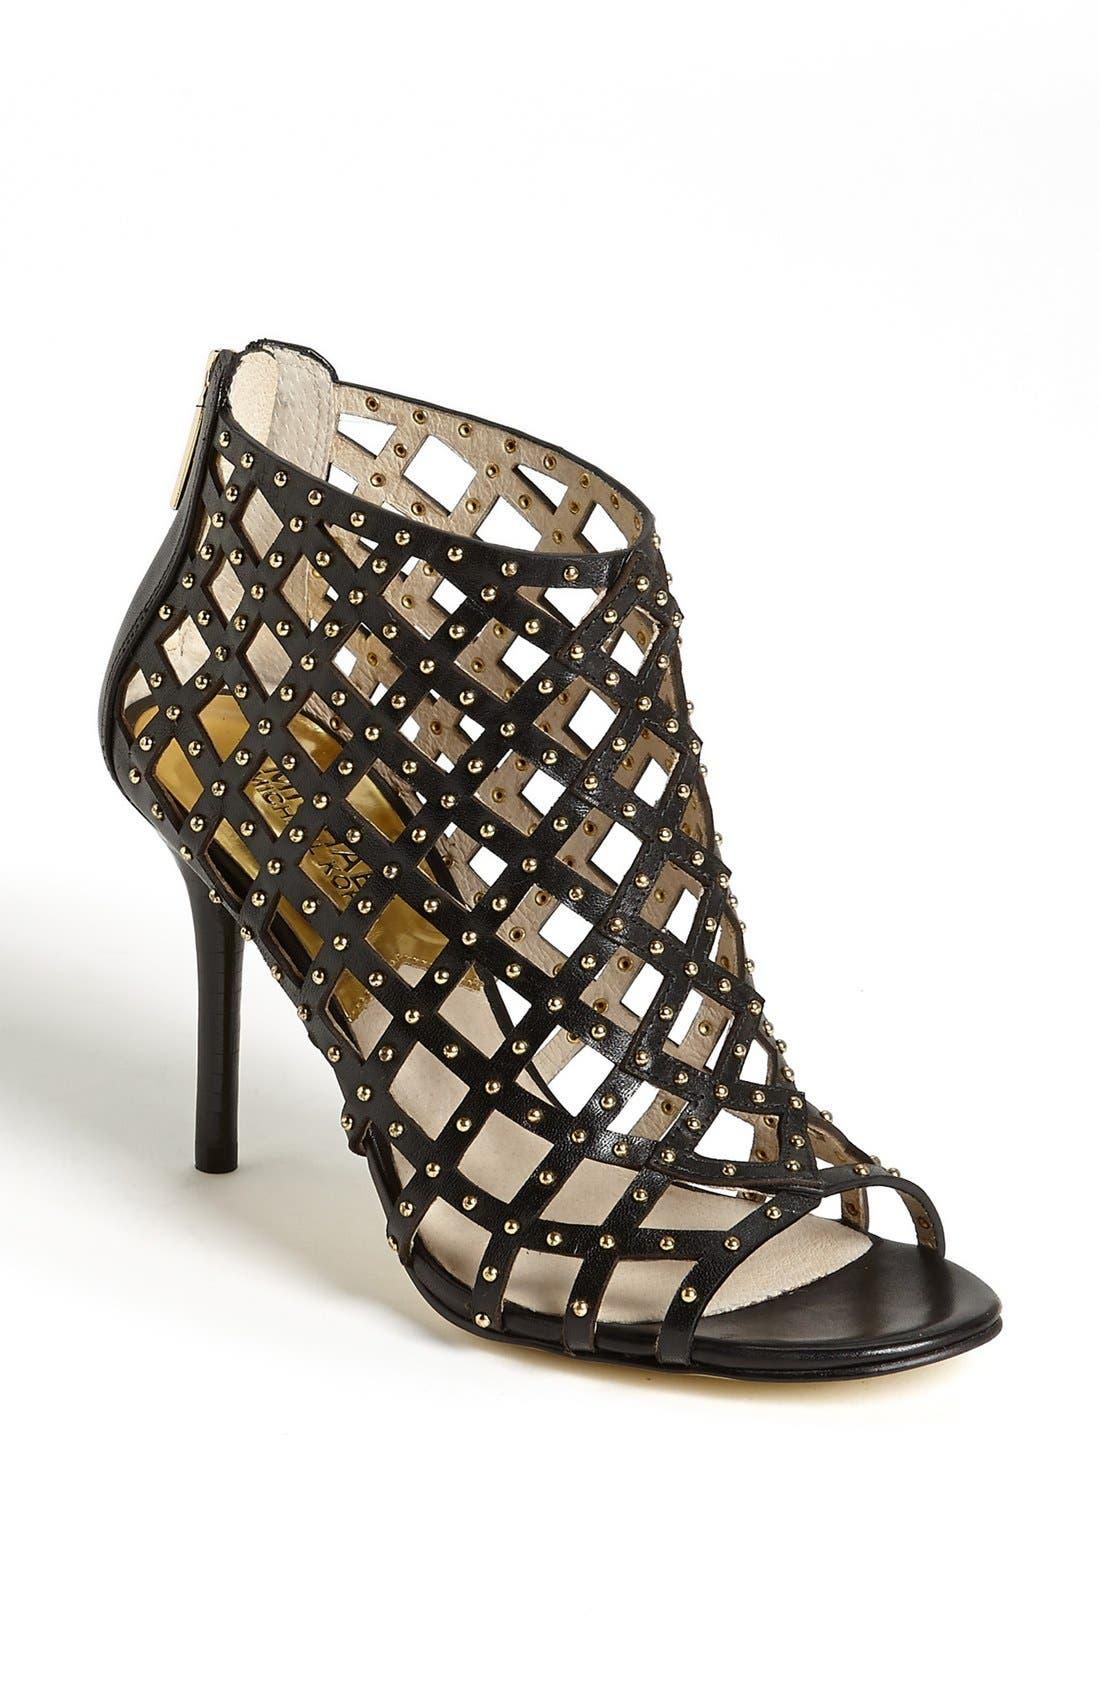 Main Image - MICHAEL Michael Kors 'Aiden' Sandal